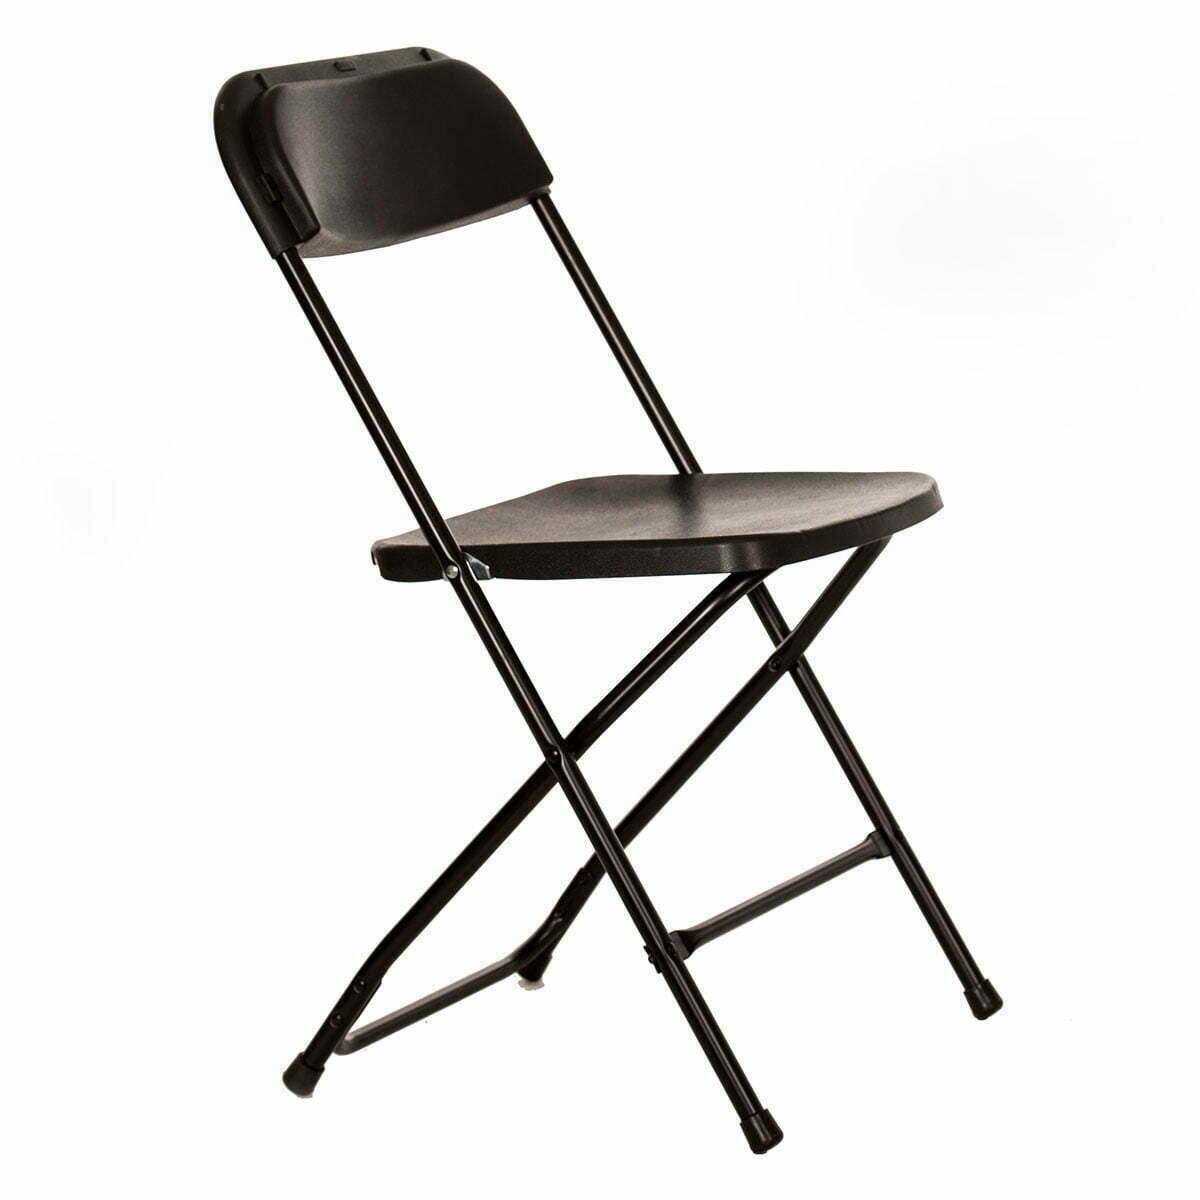 Plastic folding chair - Angle